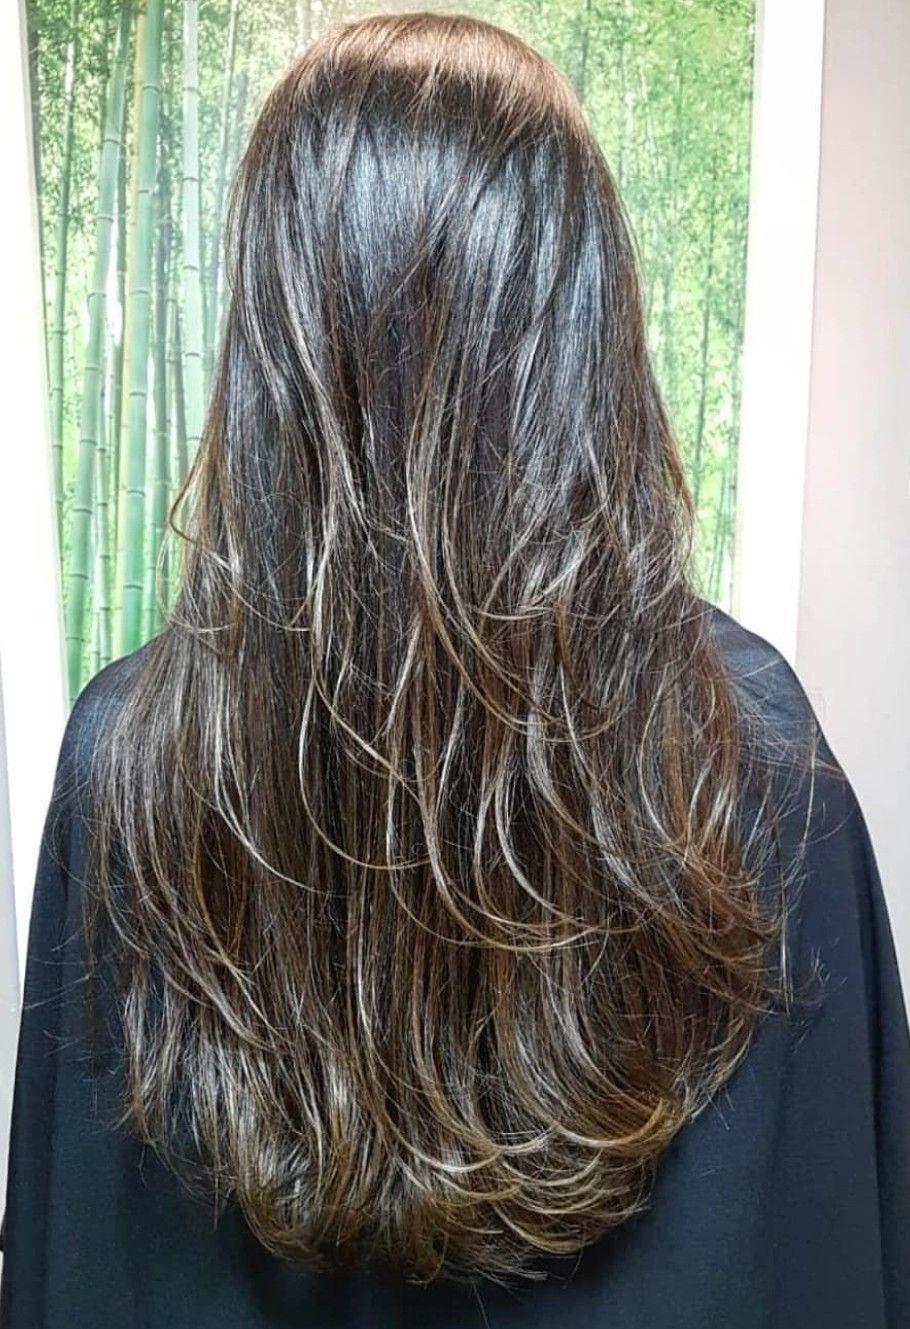 Pin by Ananya on Hairs in 2019  ba38b64cd